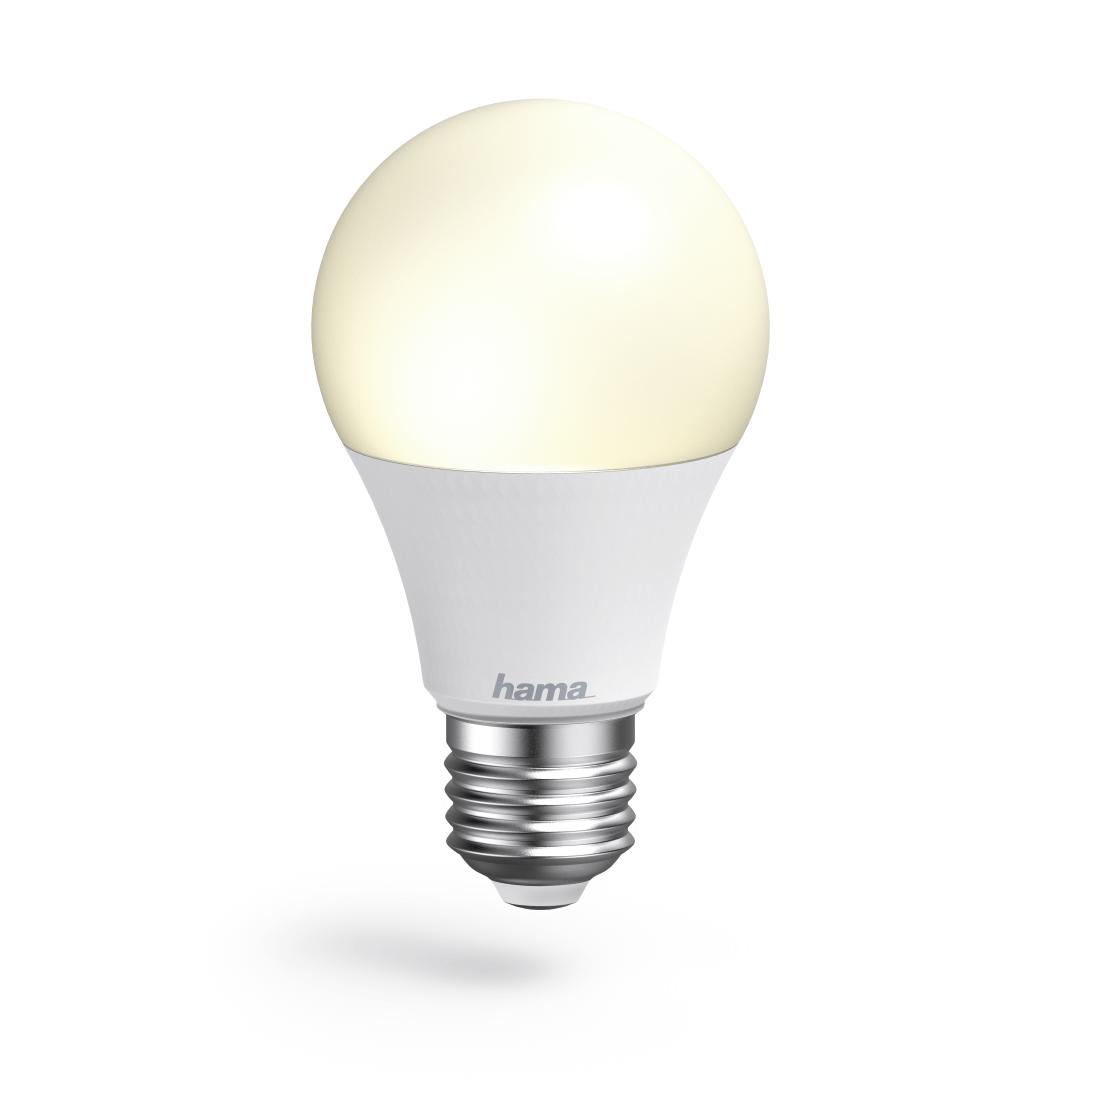 dürfen in dimmbare lampen nur bestimmte glühbirnen